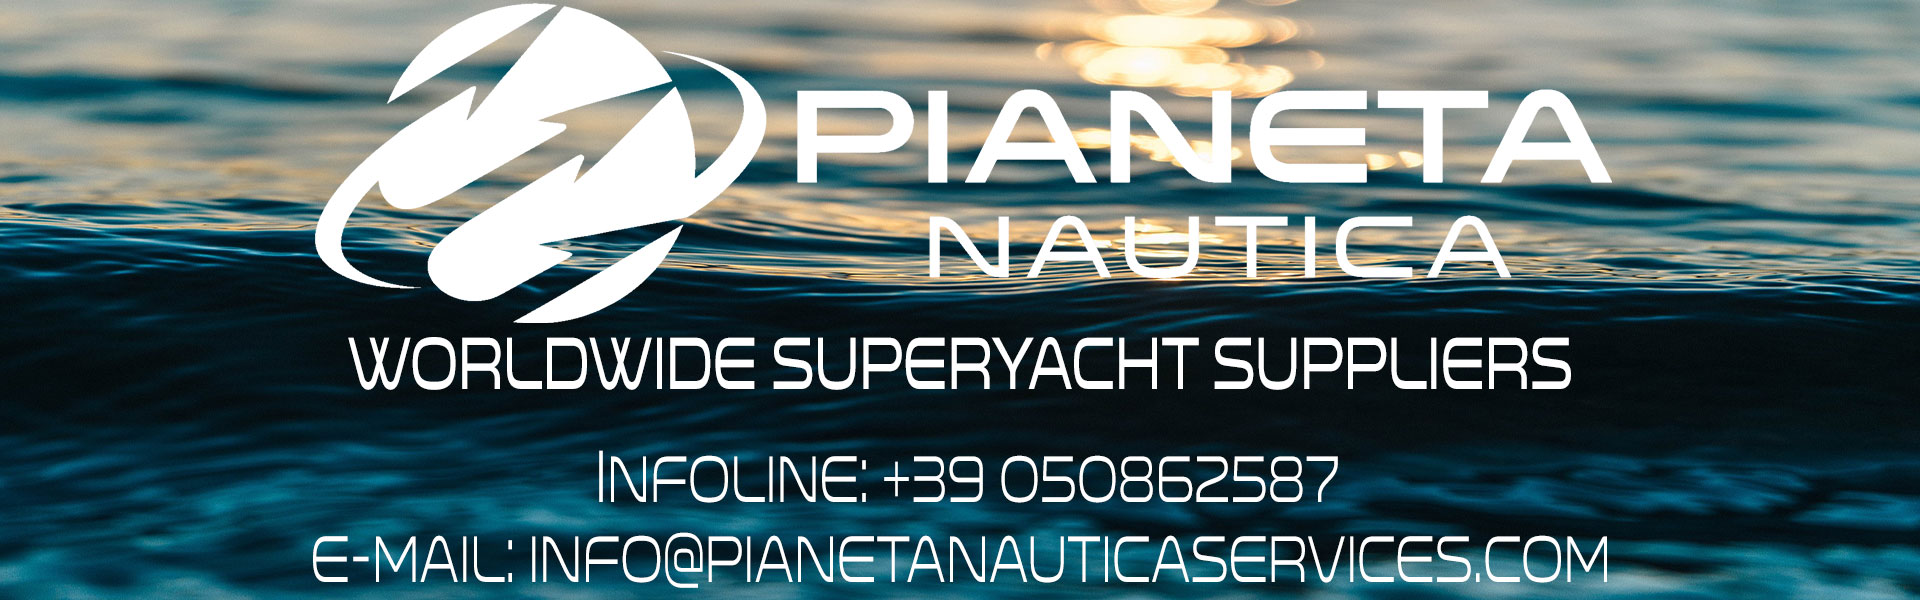 Pianeta Nautica Services, Worldwide Superyacht Suppliers